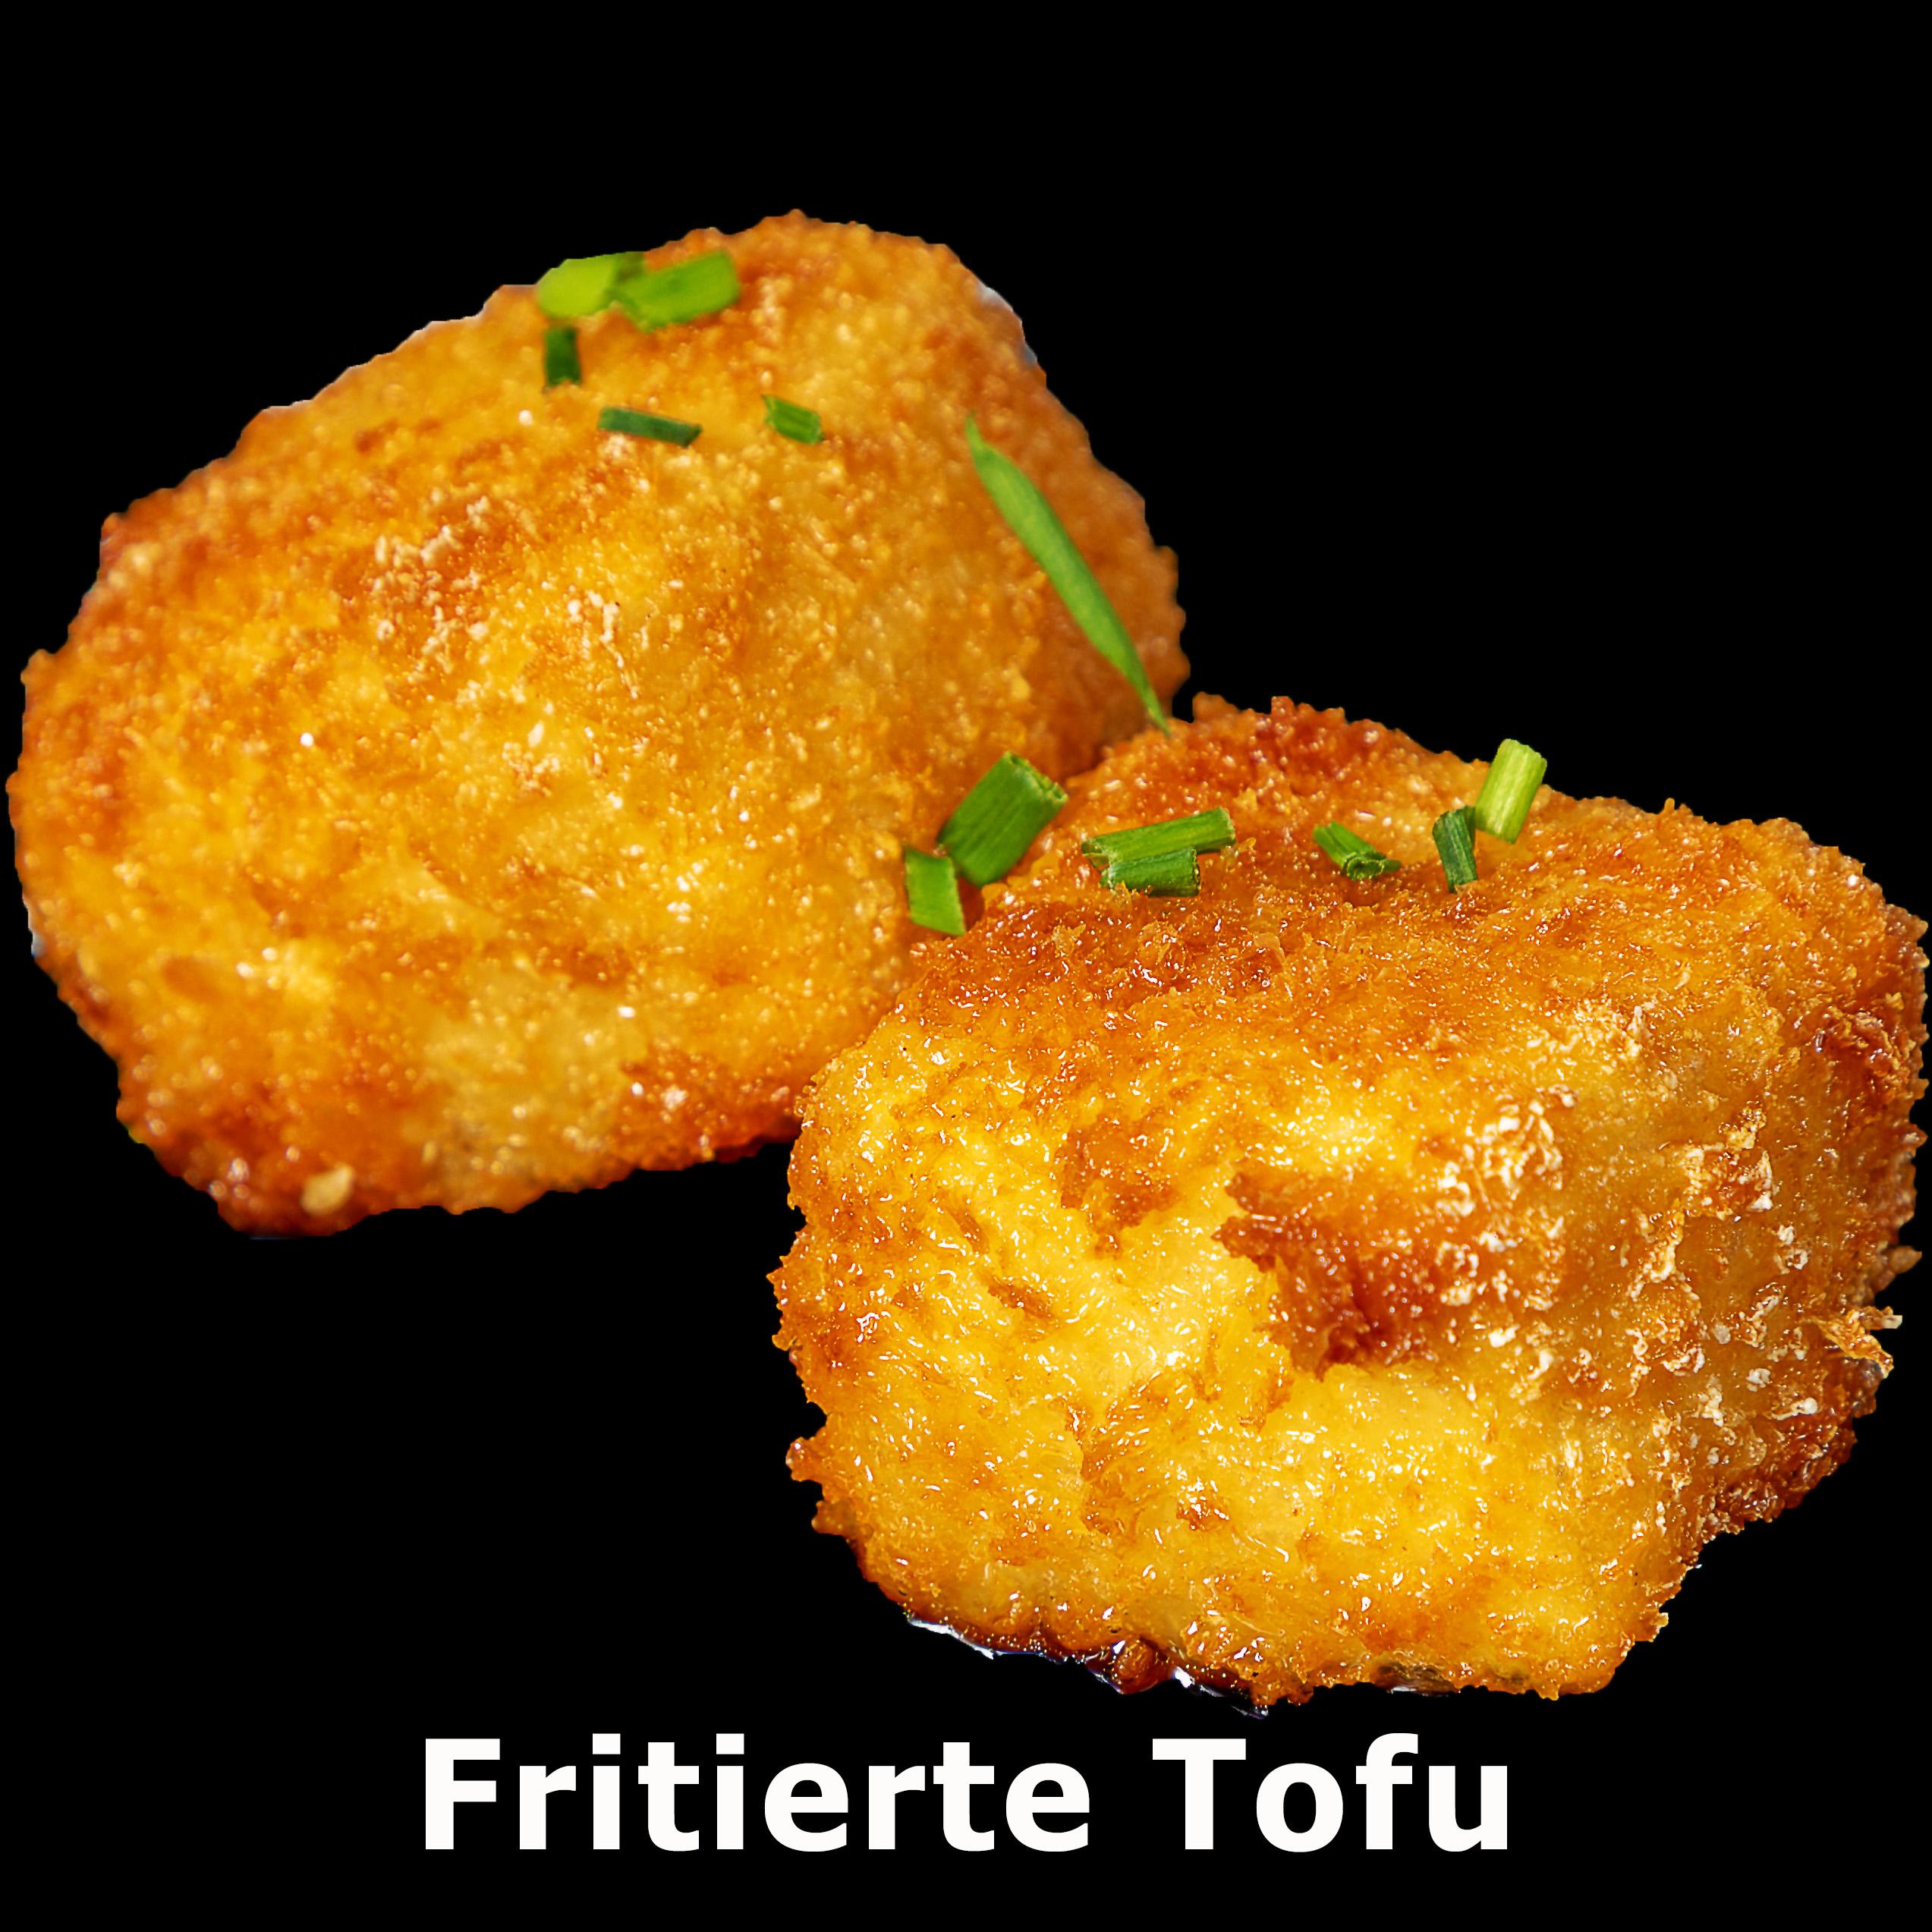 109. Fritierte Tofu